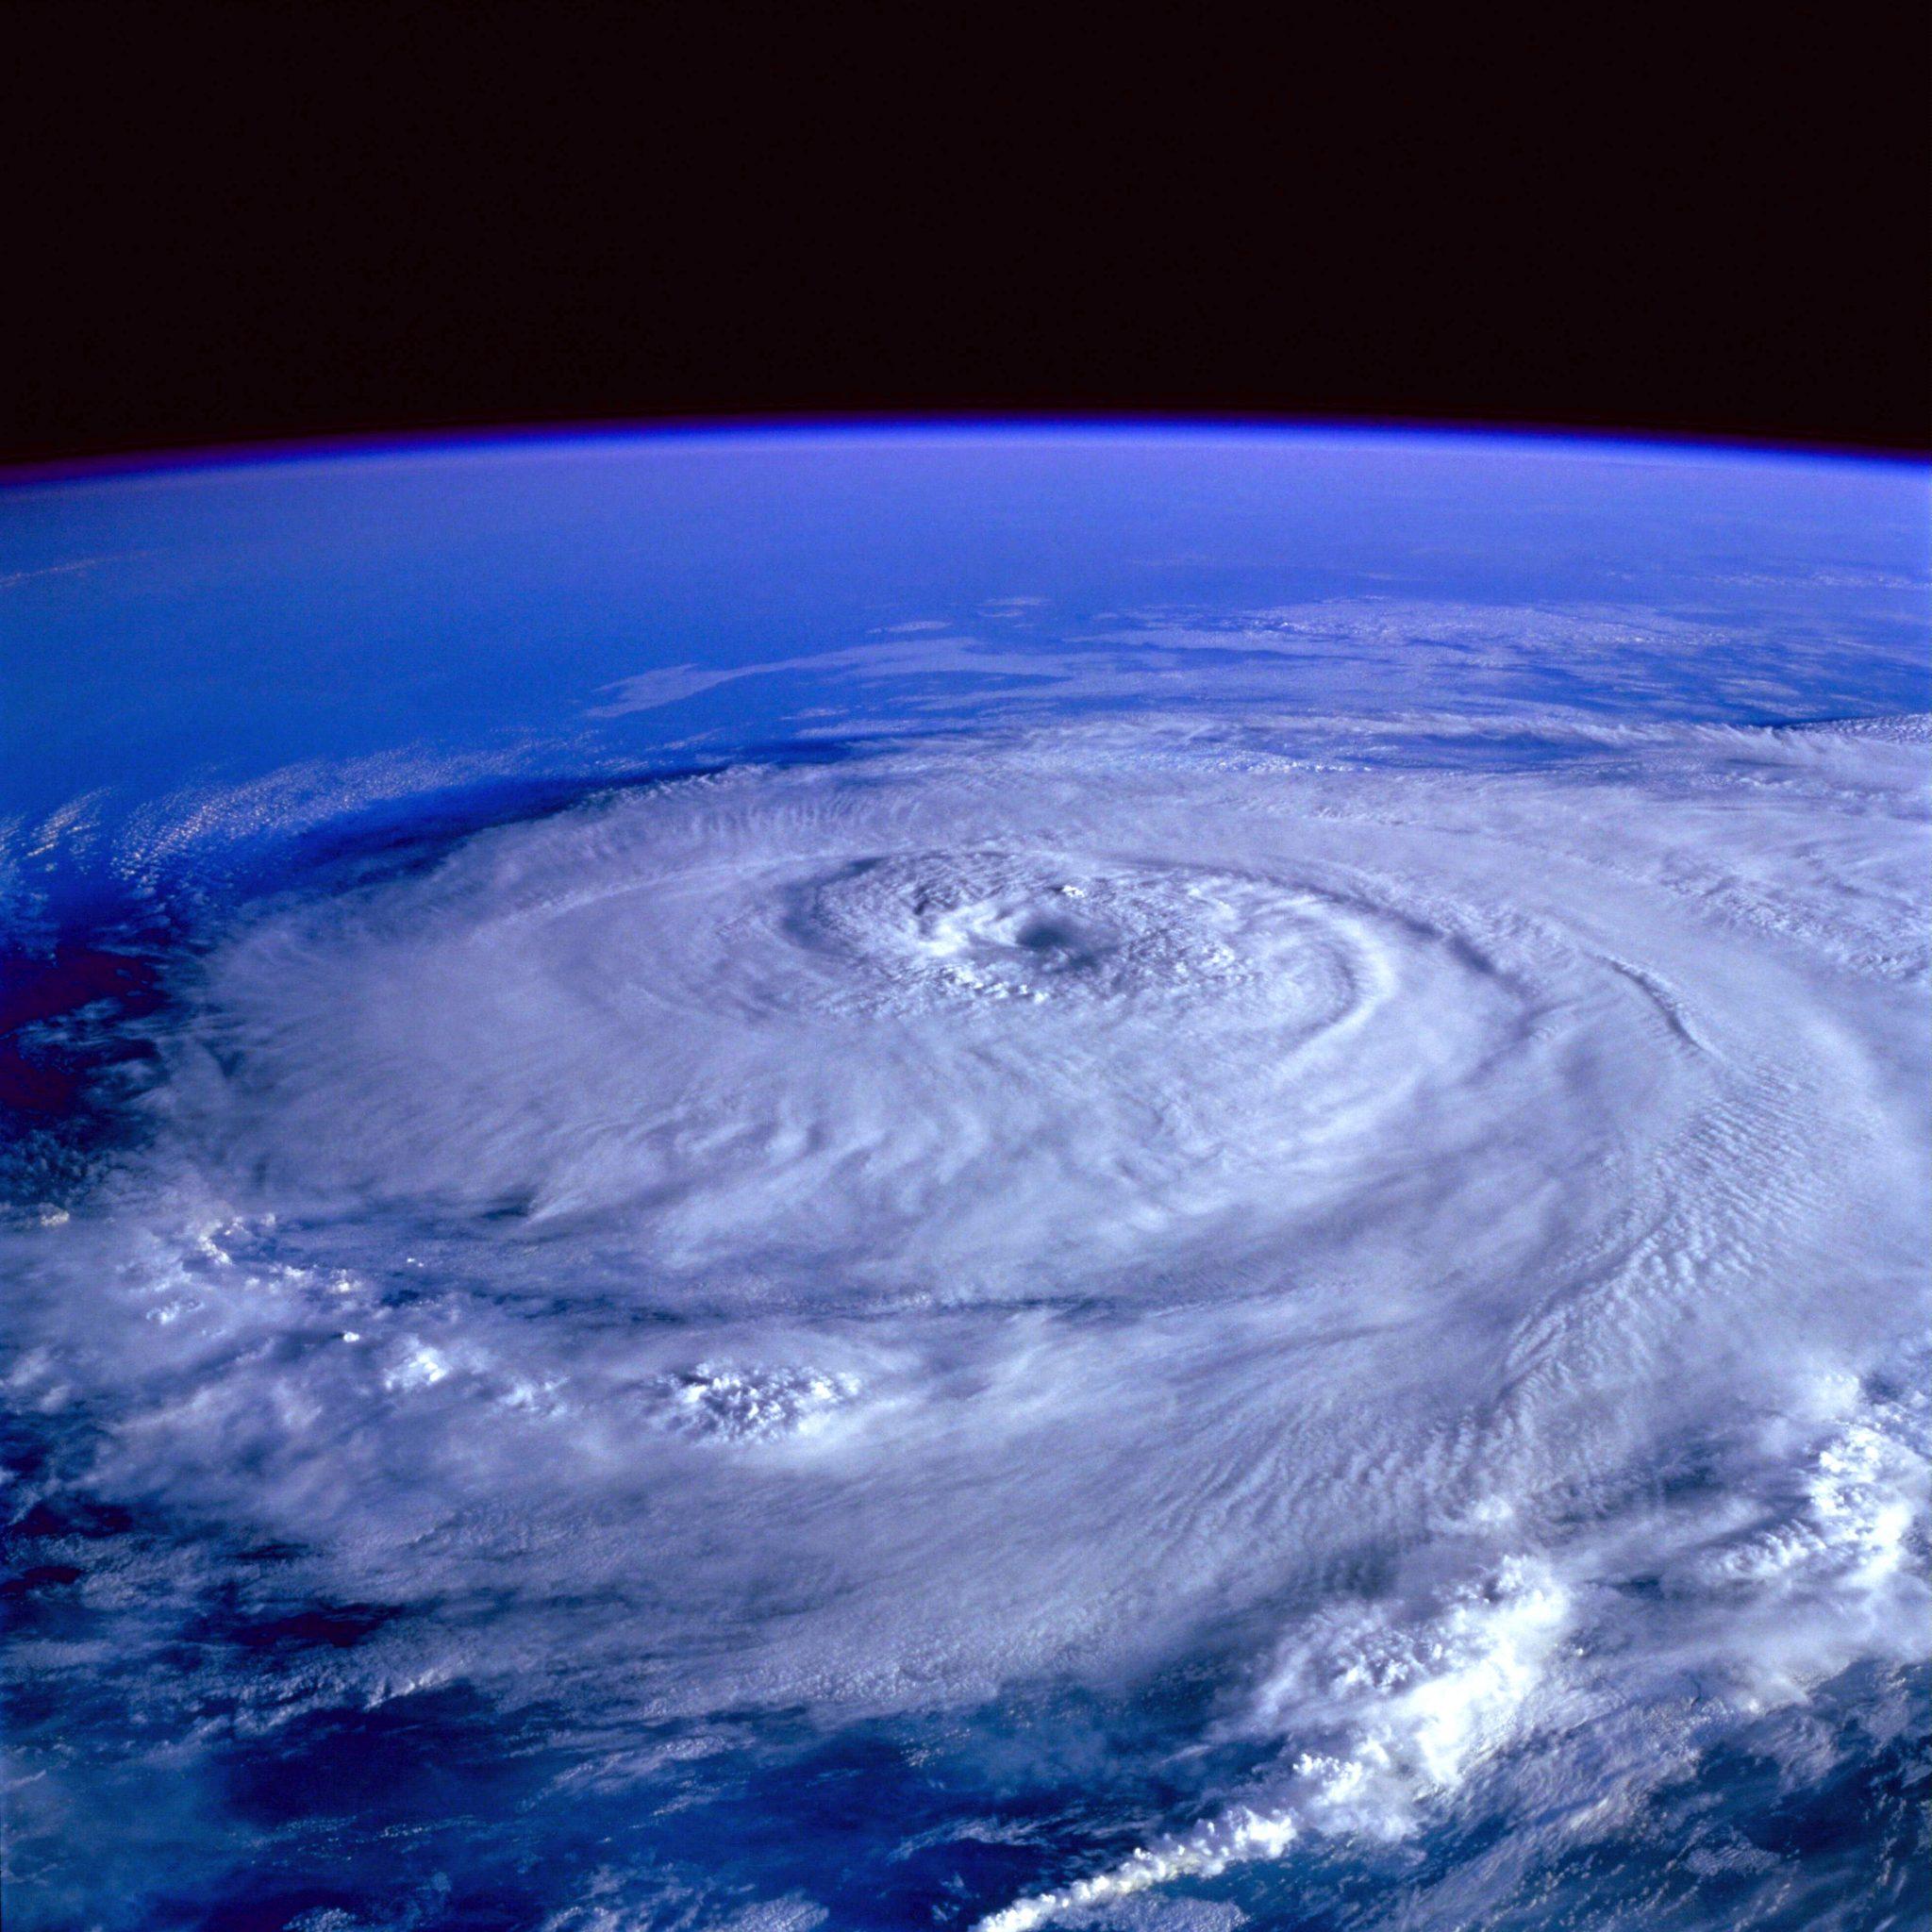 Orkaan Elena boven de golf van Mexico ter illustratie. (Foto Wikipedia)